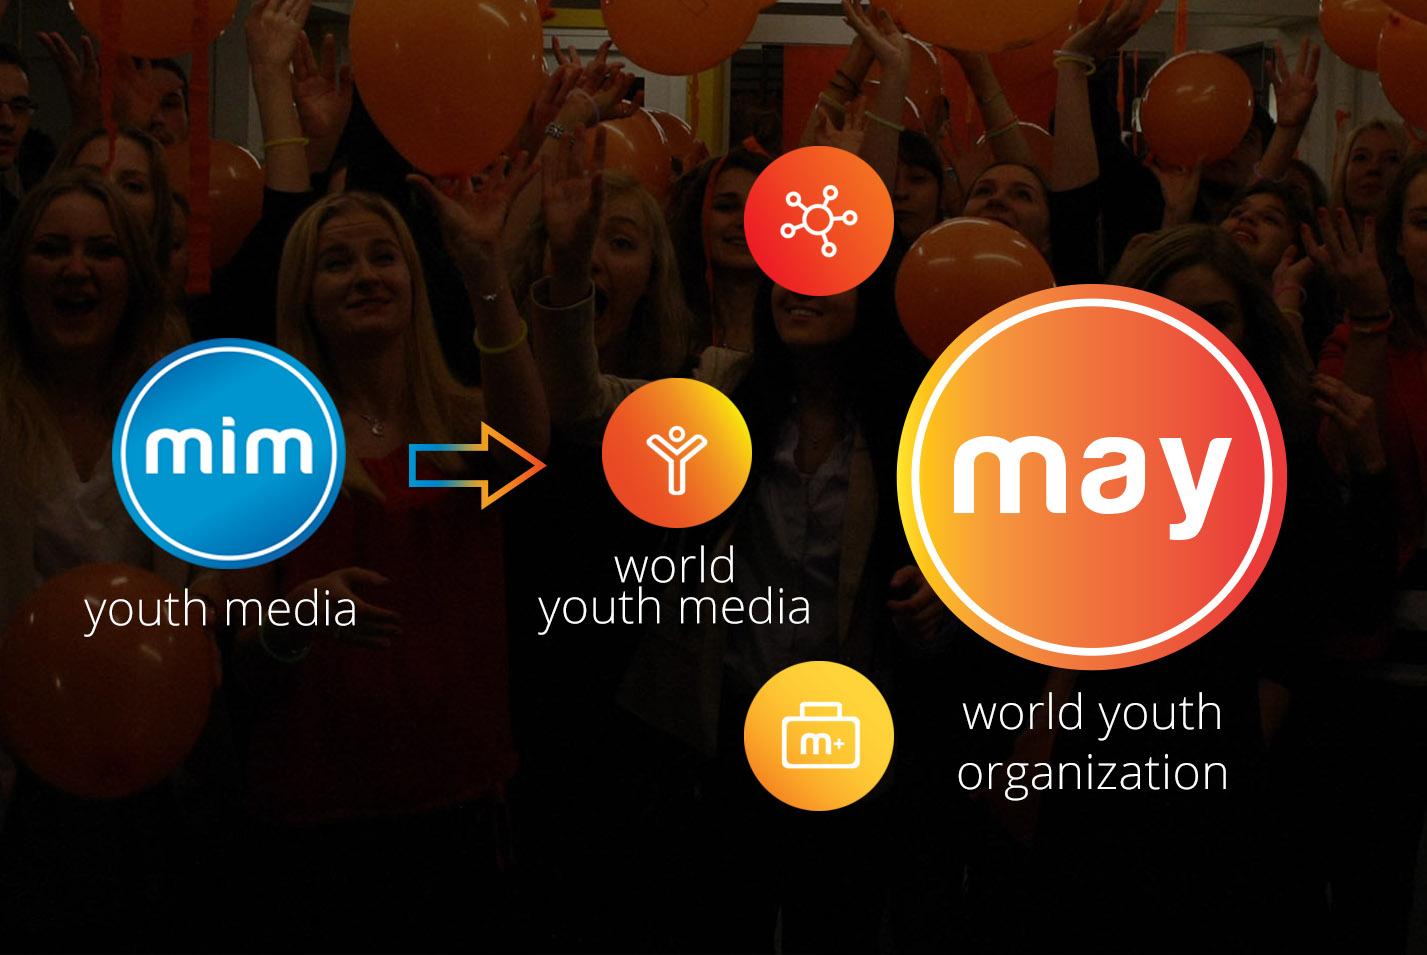 MaY absorbs MiM - birth of the MaY Idea